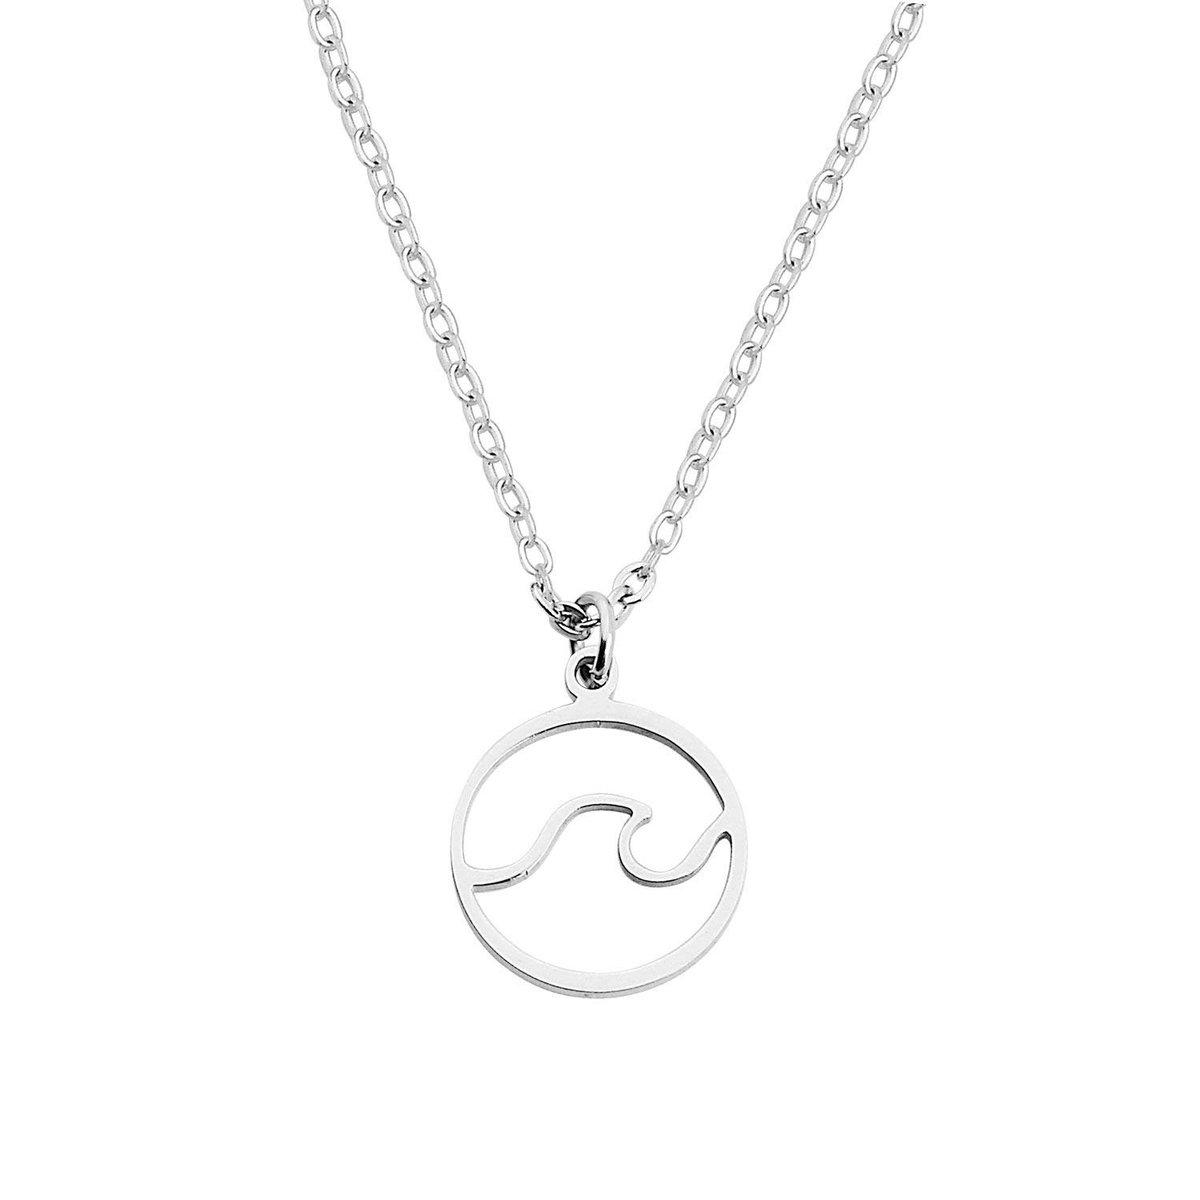 MYOSPARK Be a Mermaid and Make Waves Bracelet Inspirational ID Bracelet Ocean Jewelry